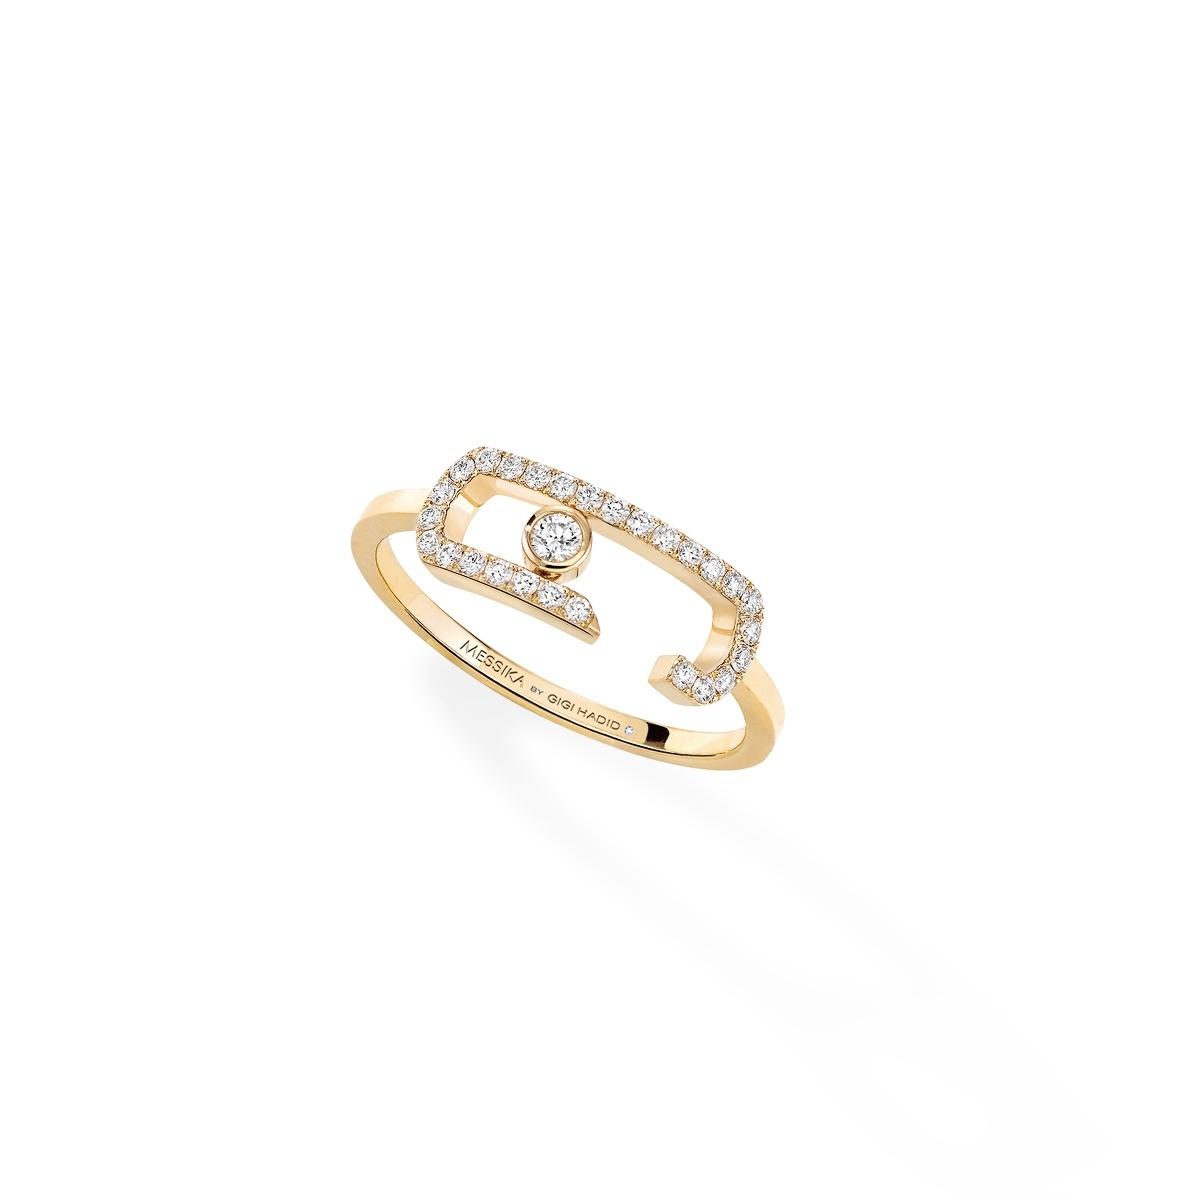 joyeria, gigi hadid, oro, diamantes, coleccion, imagen